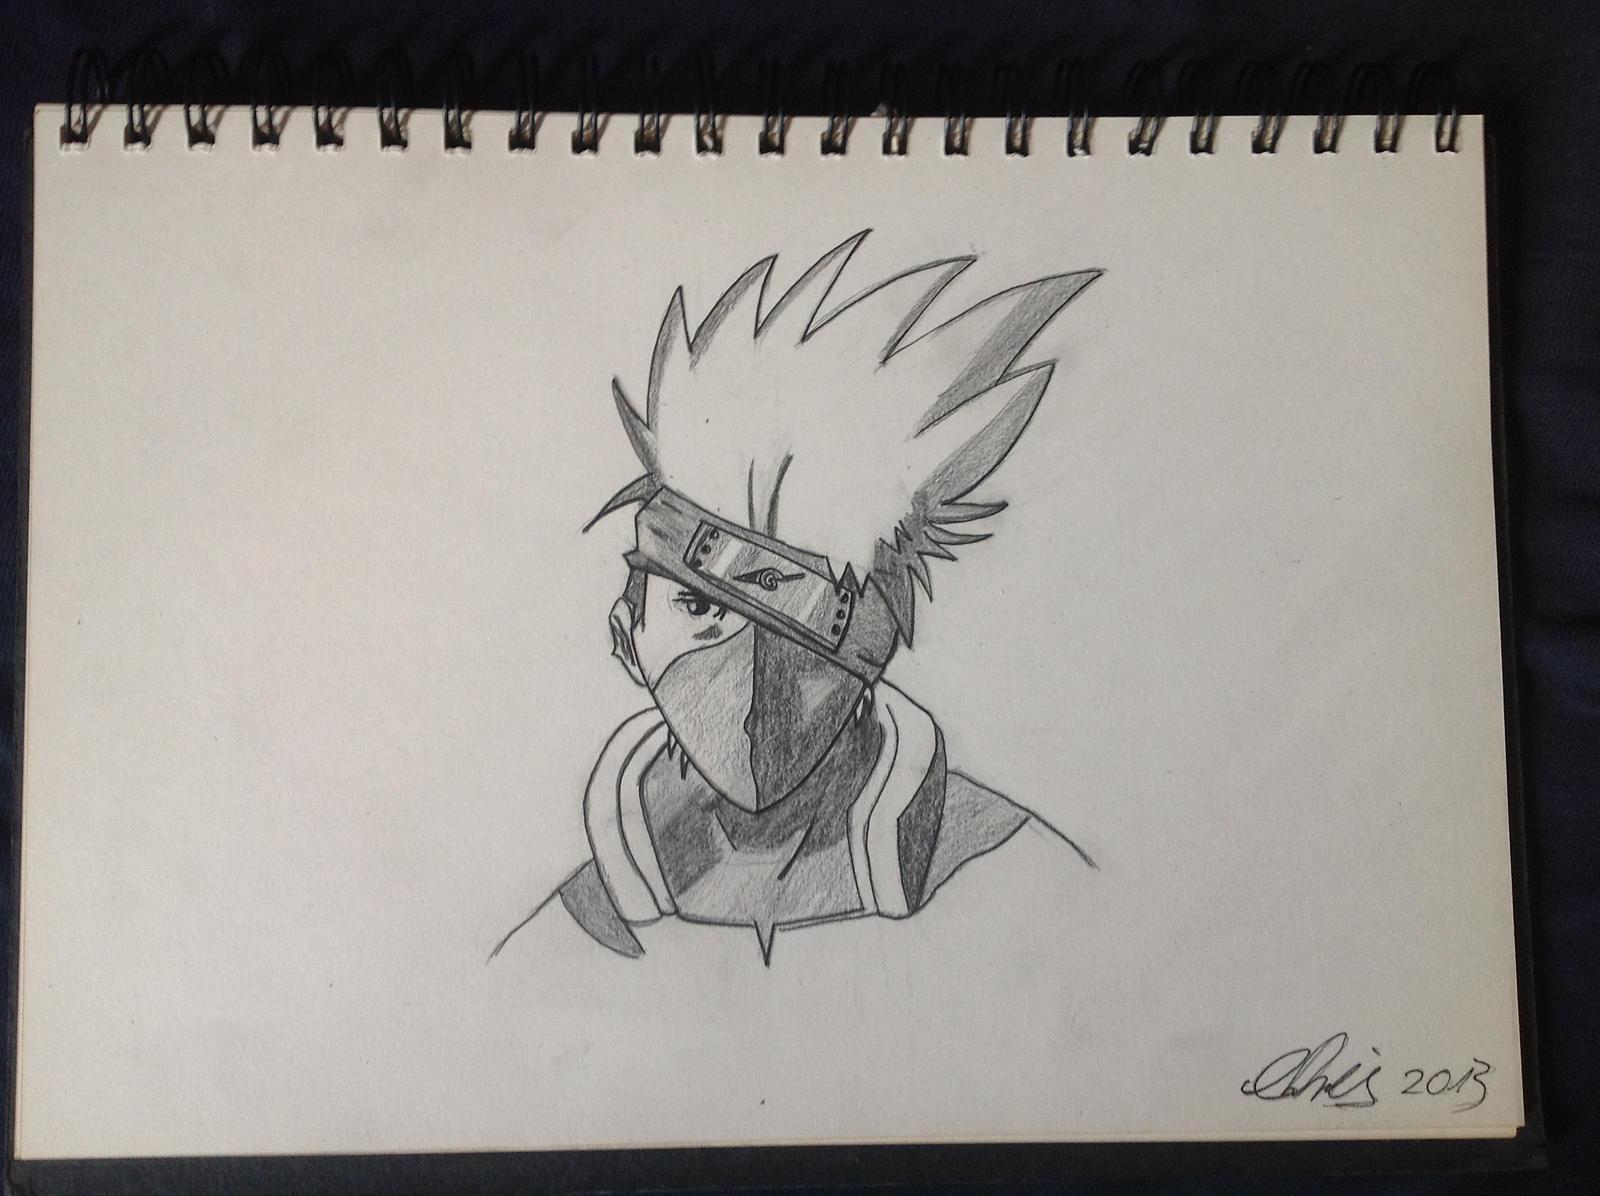 Cj Scribble Drawing : Kakashi hatake pencil sketch by otaku design on deviantart